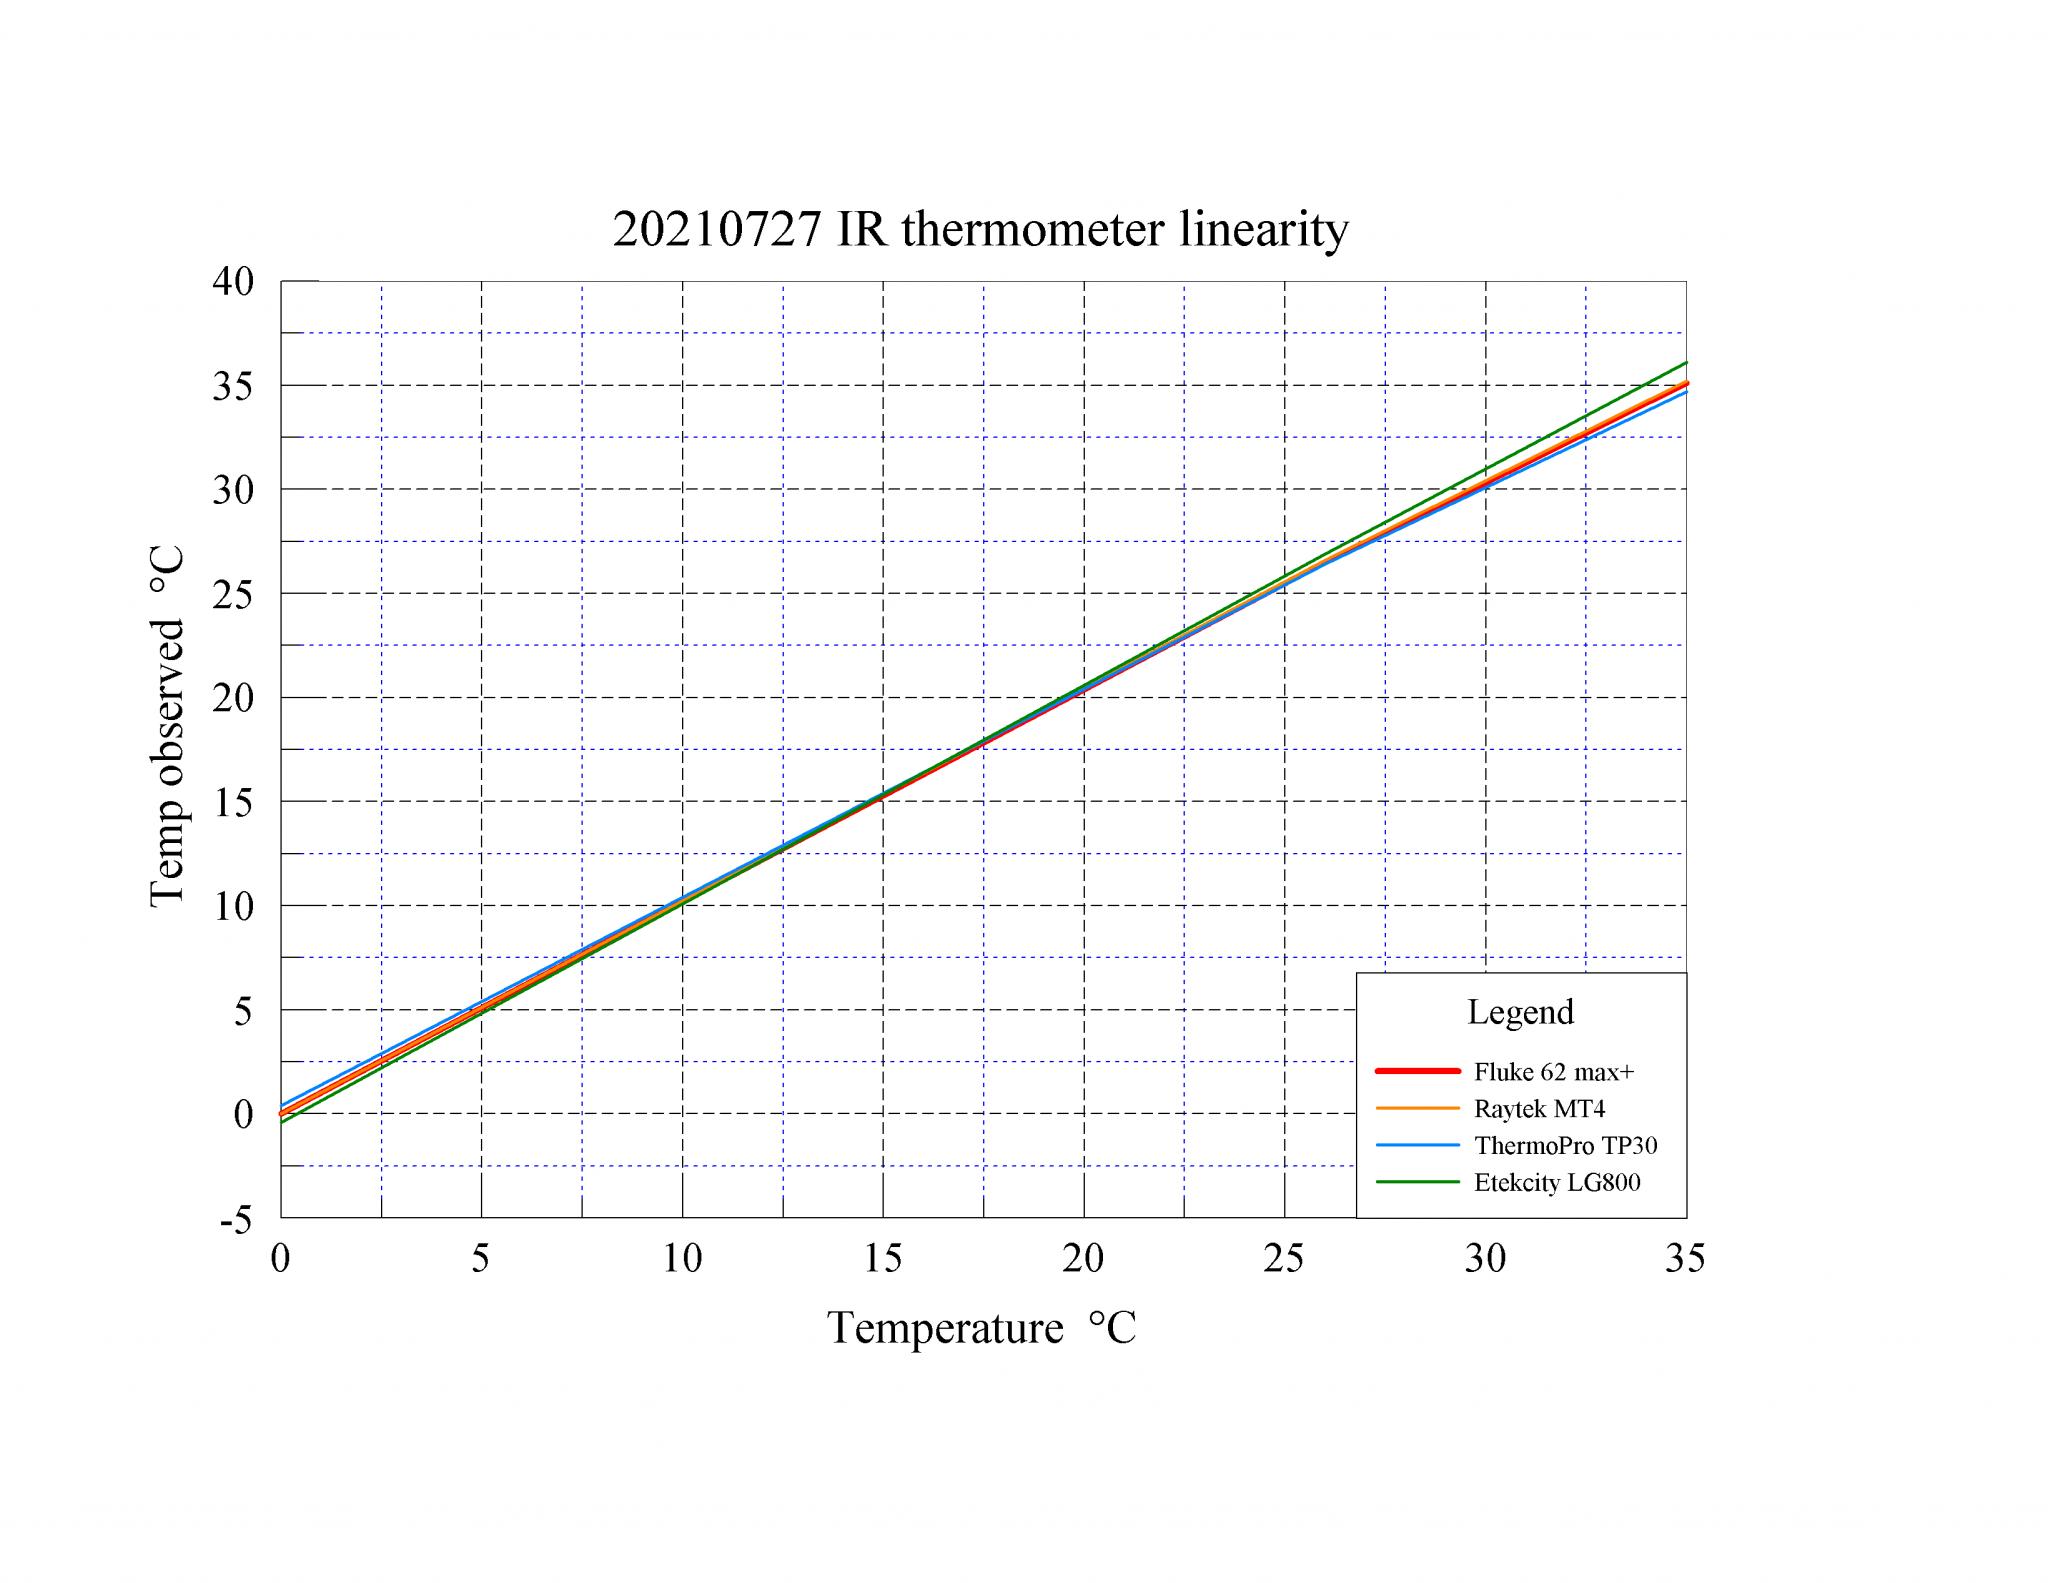 06 20210727 sensor calibration - psi plot version.png